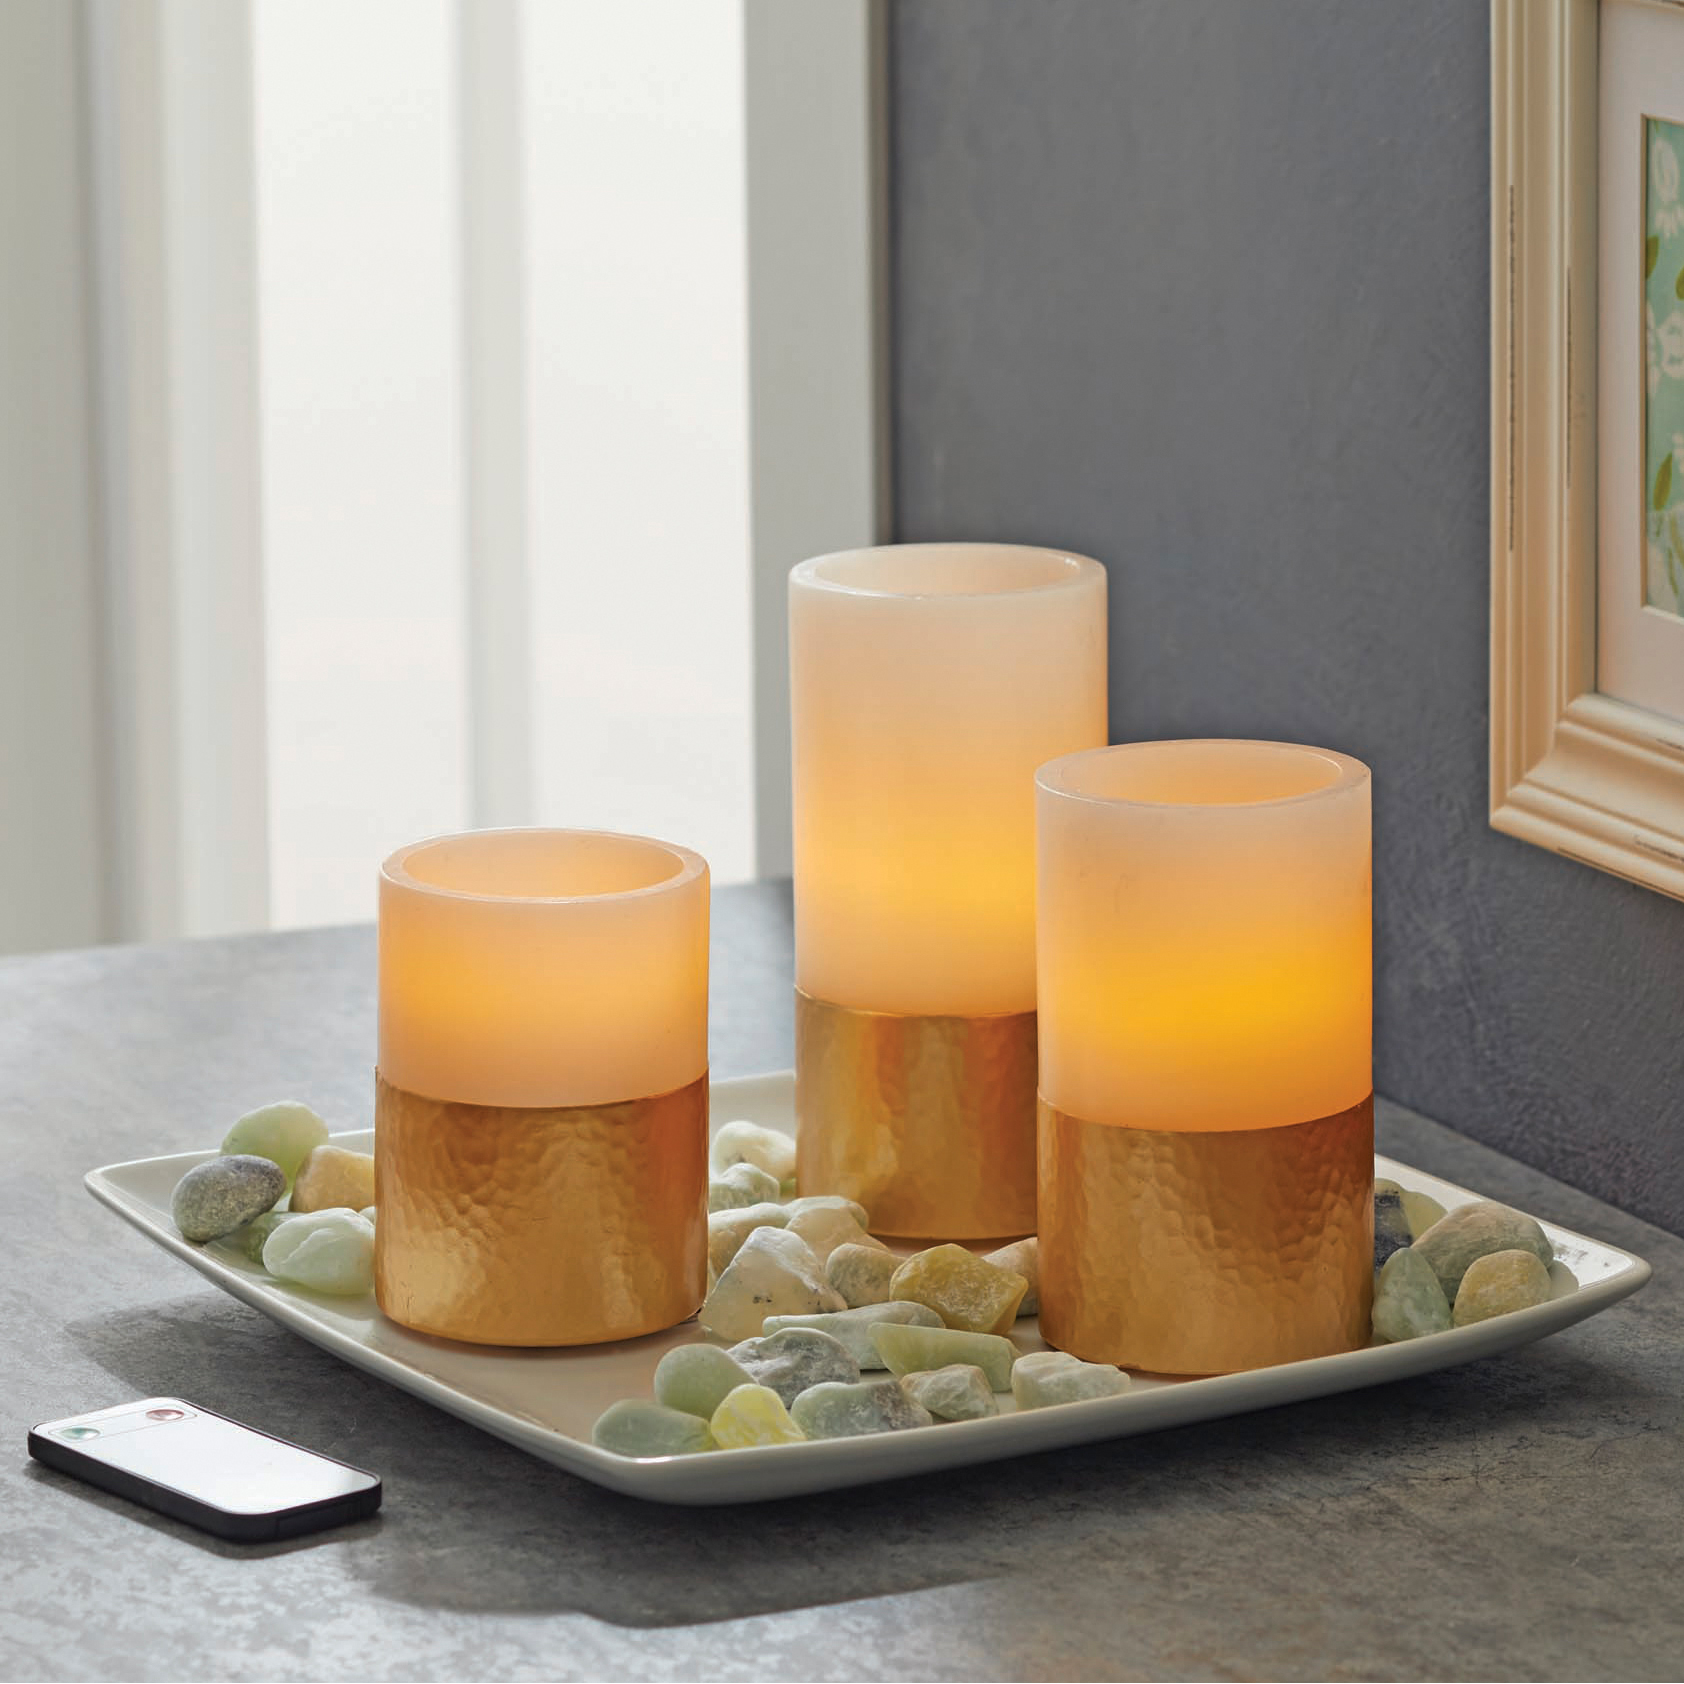 Better Homes & Gardens 3 Pack Flameless LED Pillar Candles, Hammered Metallic